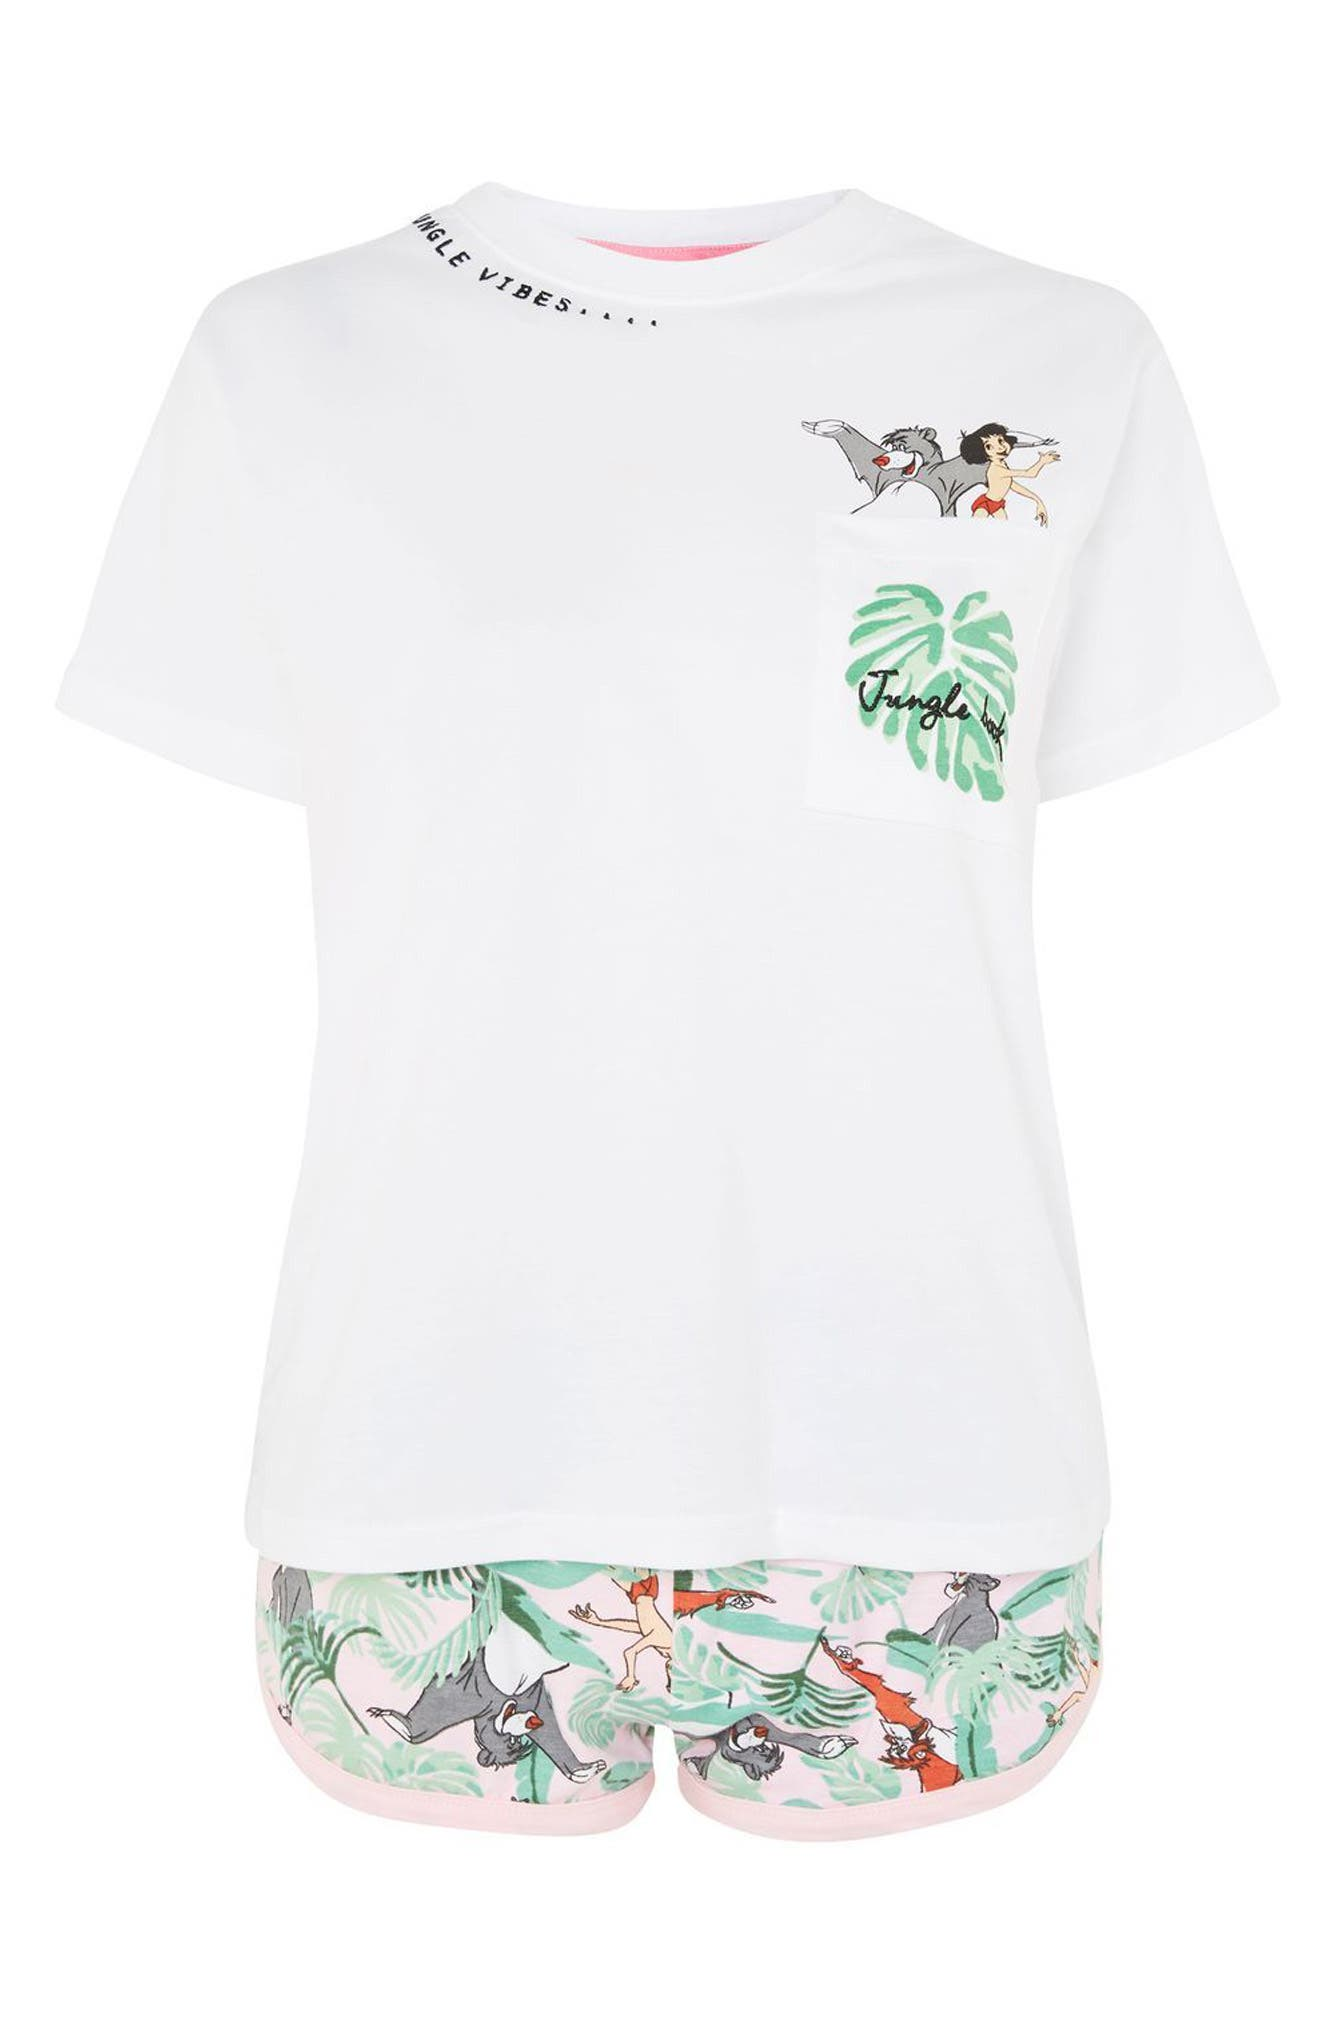 Disney<sup>®</sup> Jungle Book Short Pajamas,                             Alternate thumbnail 3, color,                             101